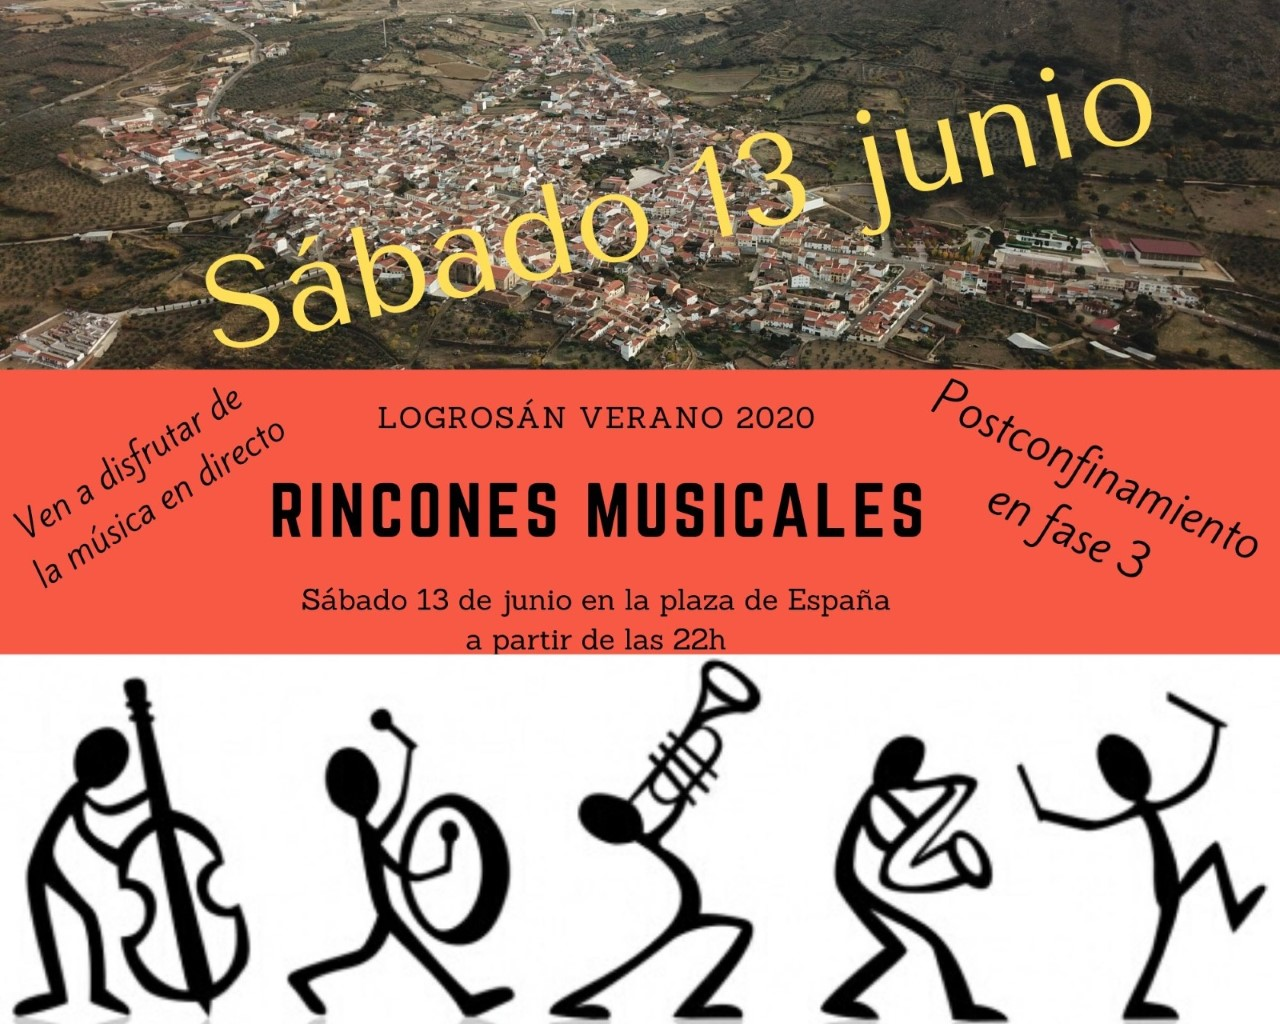 Rincones musicales 2020 - Logrosán (Cáceres)